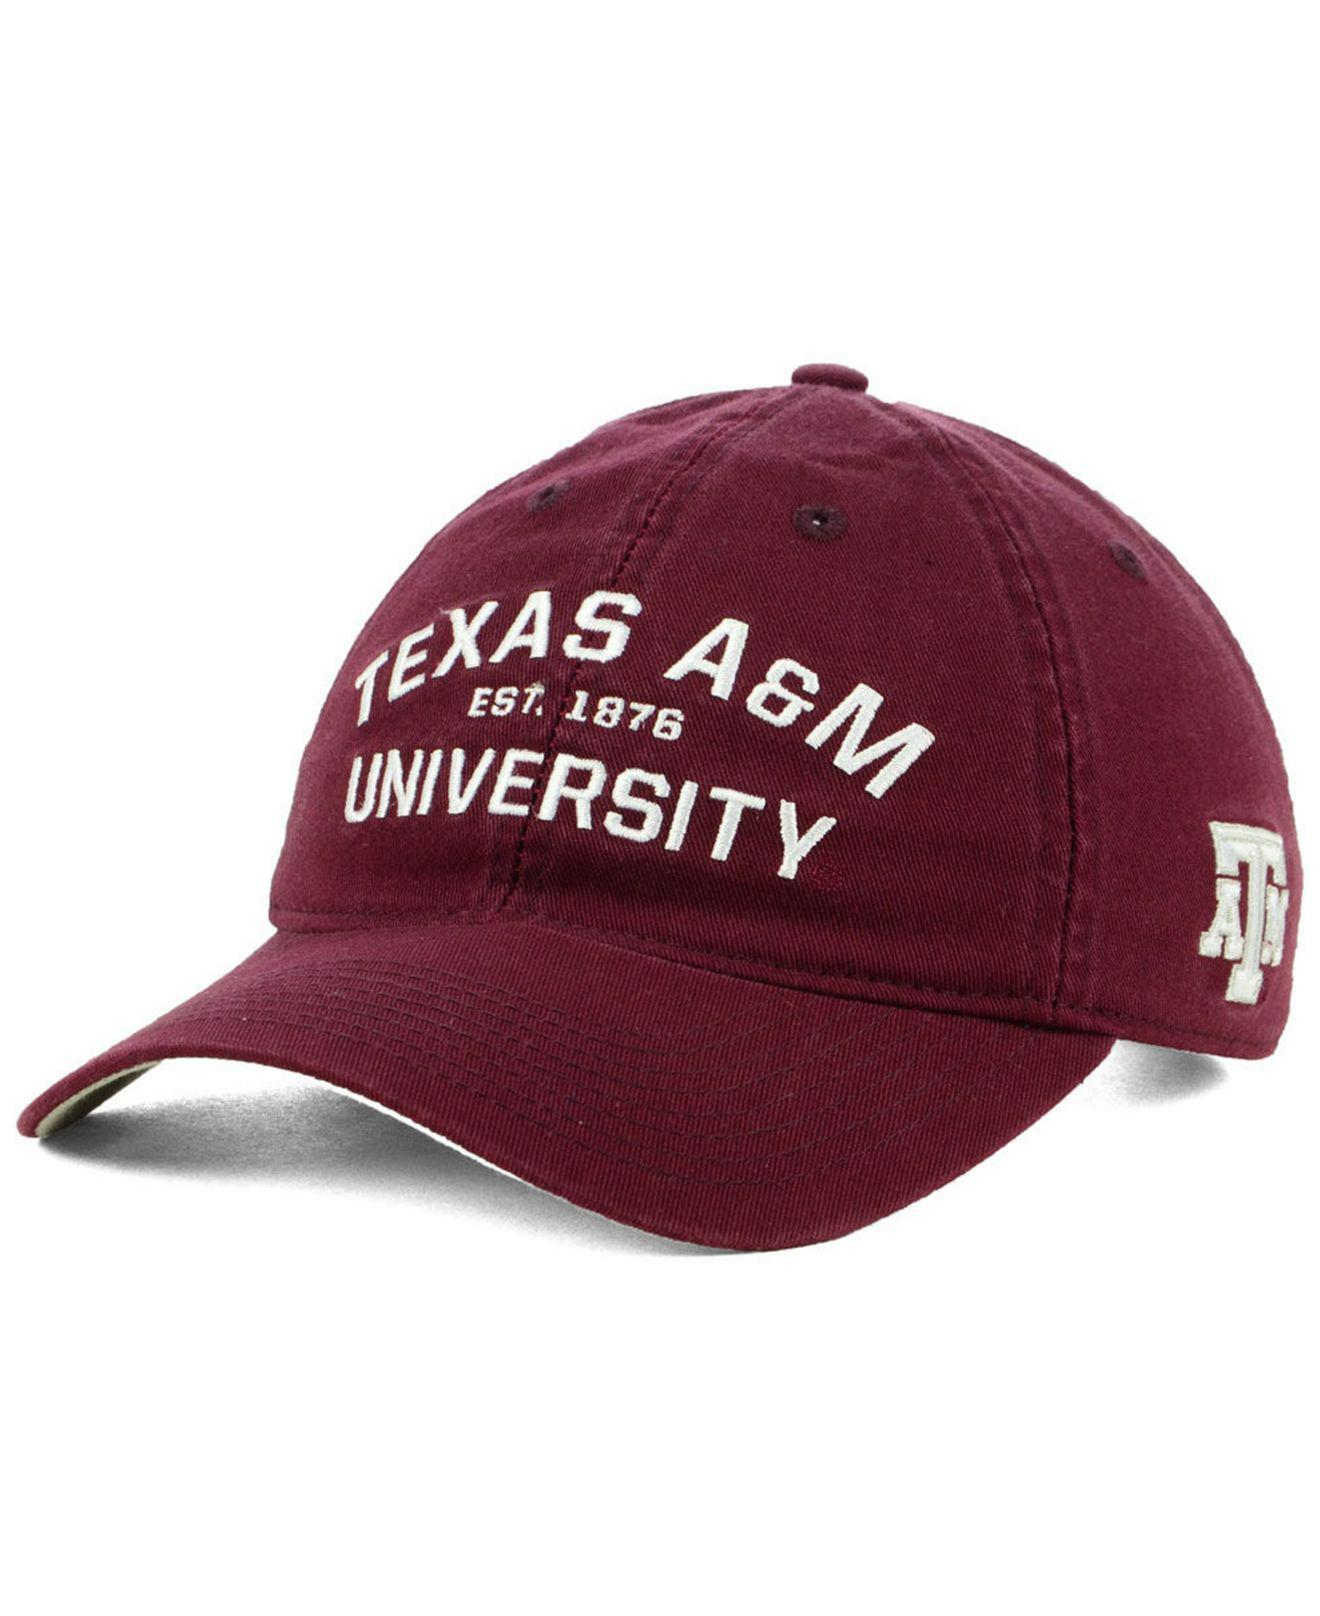 23a911ecbad adidas. Men s Red Texas A m Aggies Stadium Performance Wordmark Adjustable  Strapback Cap